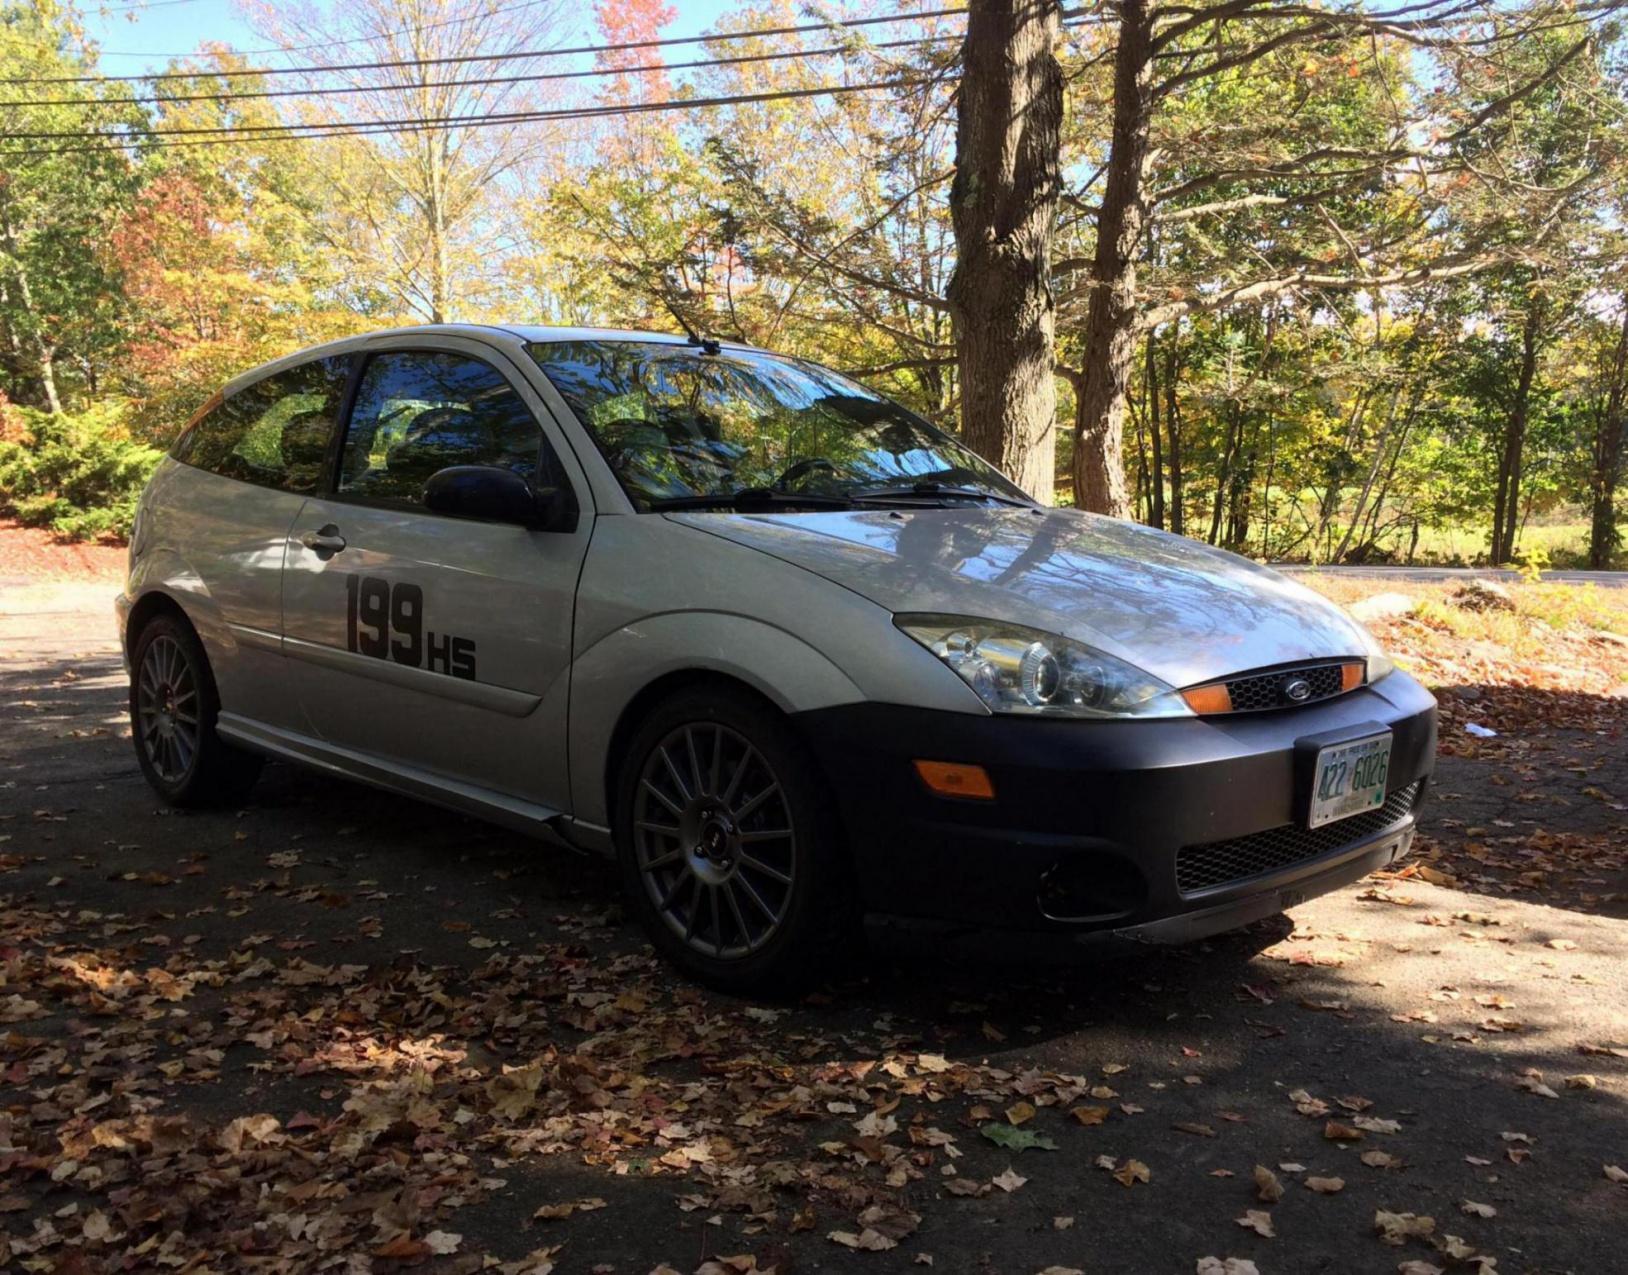 My 03 SVT HS class autox-r - Page 2 - Ford Focus Forum